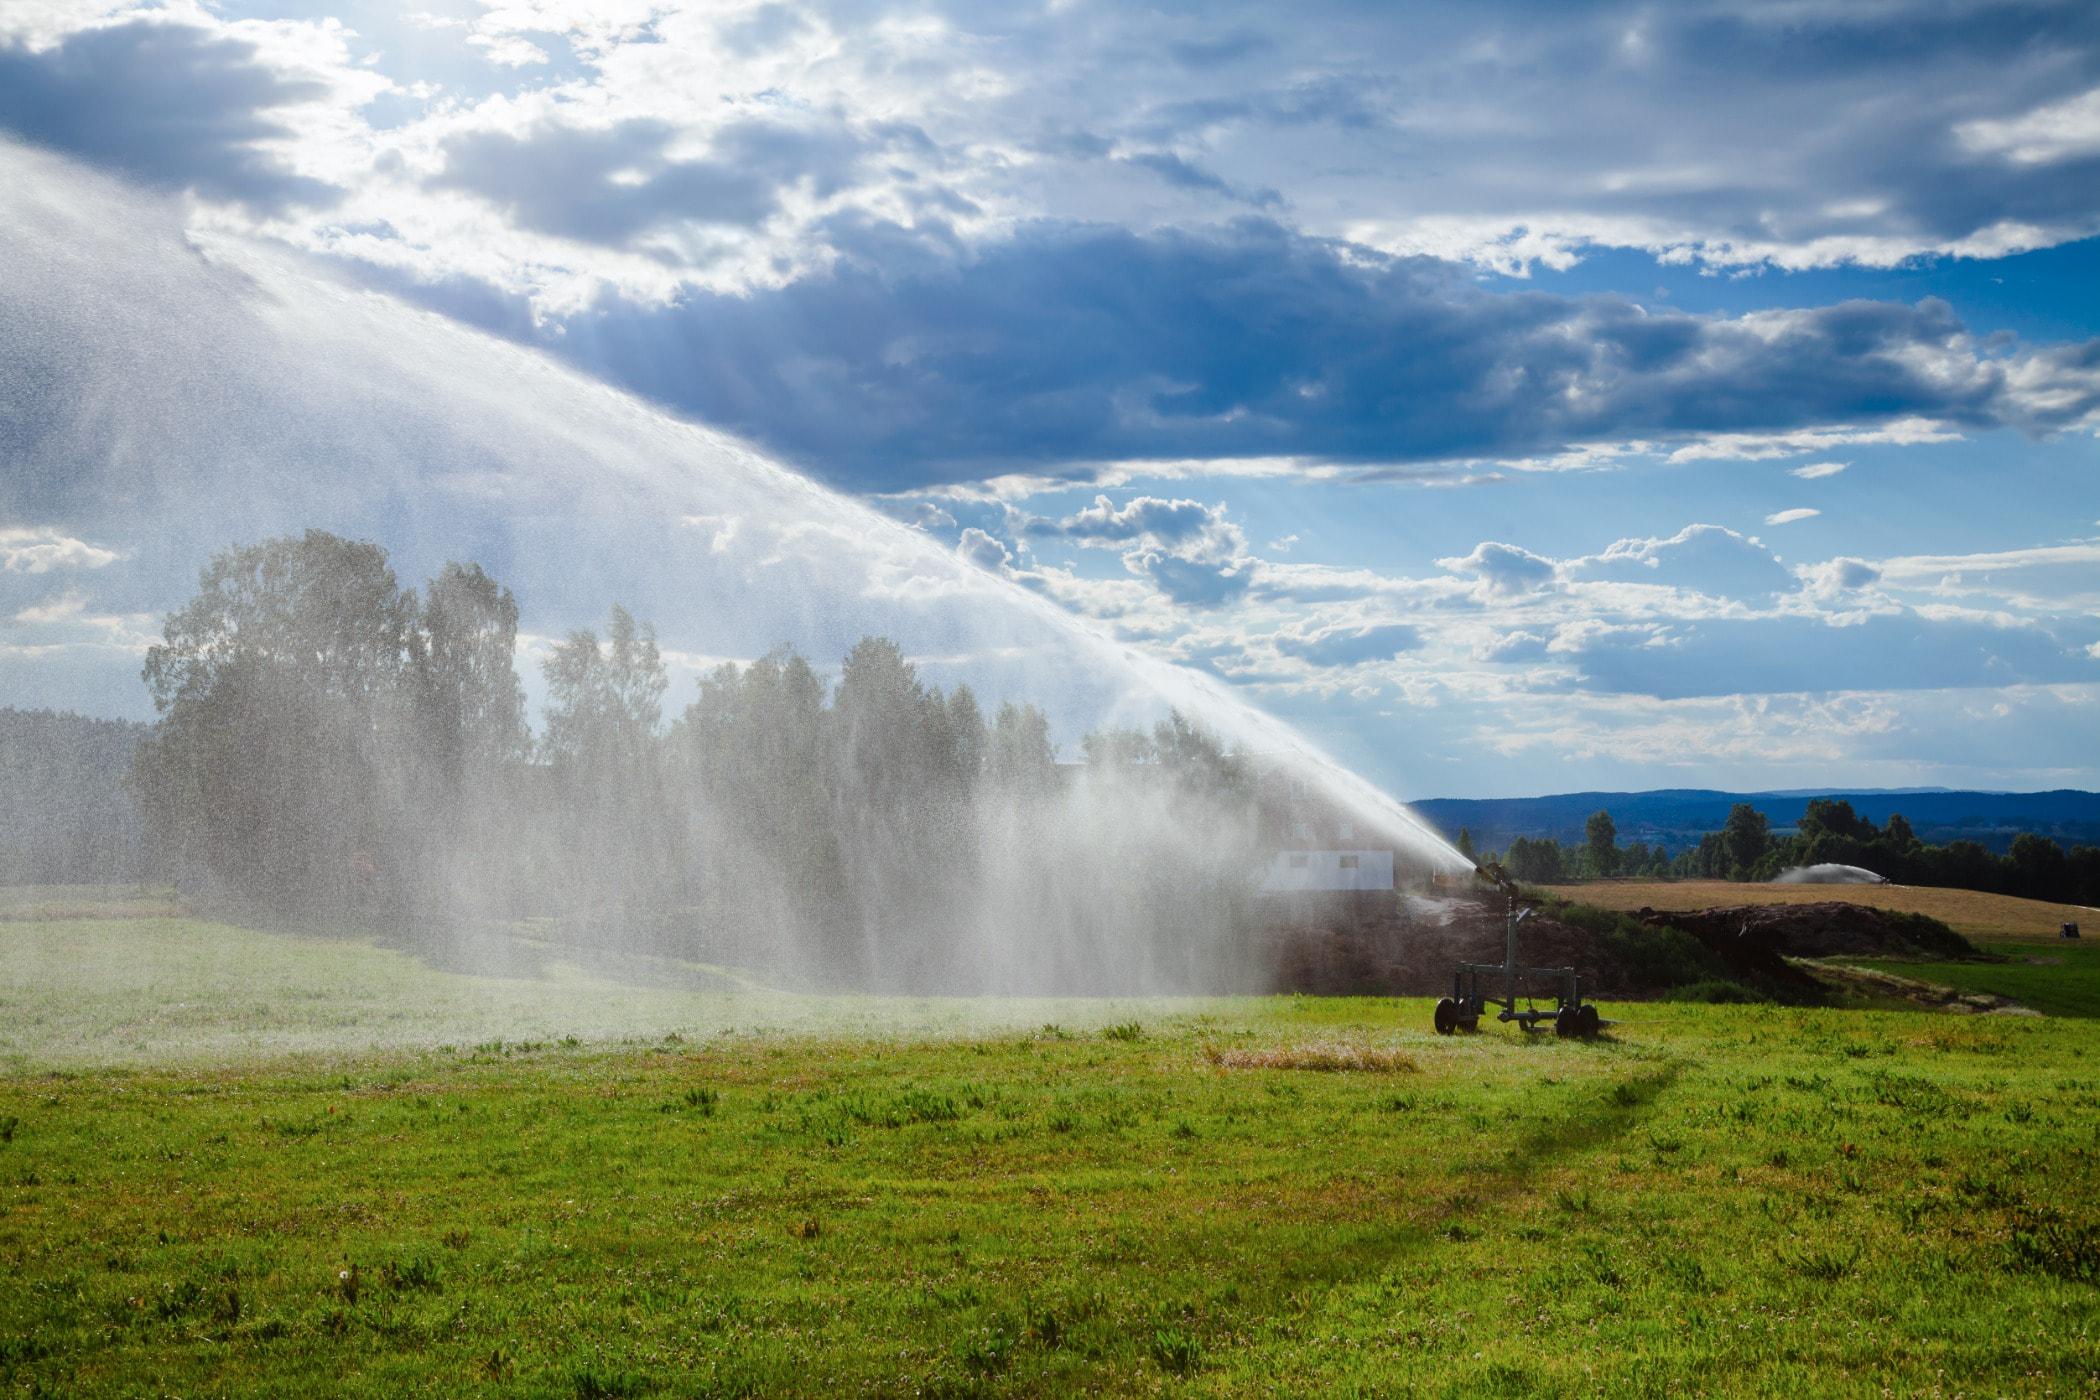 Water resources, Natural landscape, Cloud, Highland, Rainbow, Pasture, Grassland, Sky, Nature